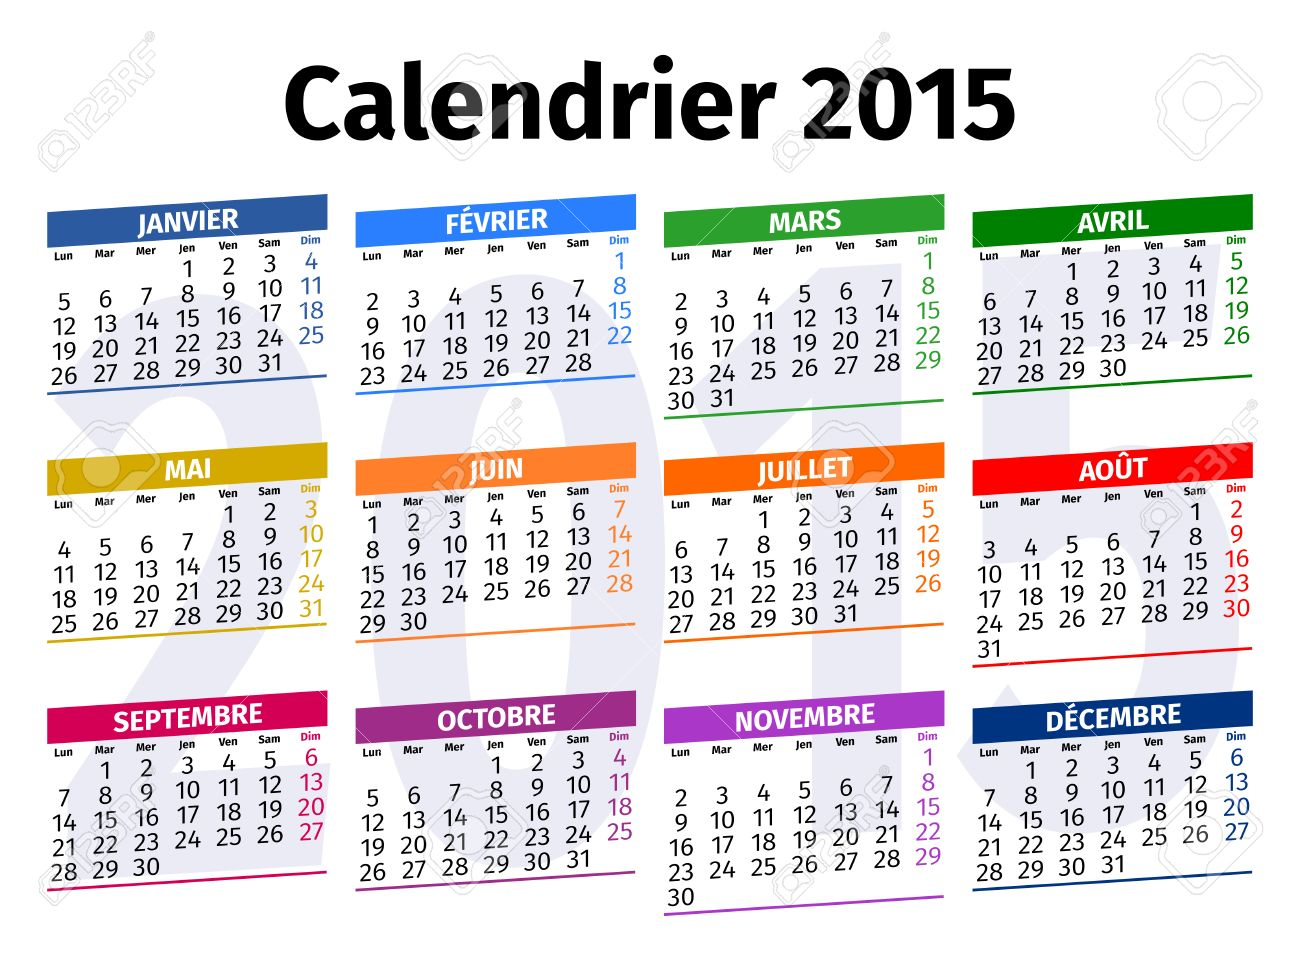 Calendario Frances.Calendario Frances En El Ano 2015 Tipo 3